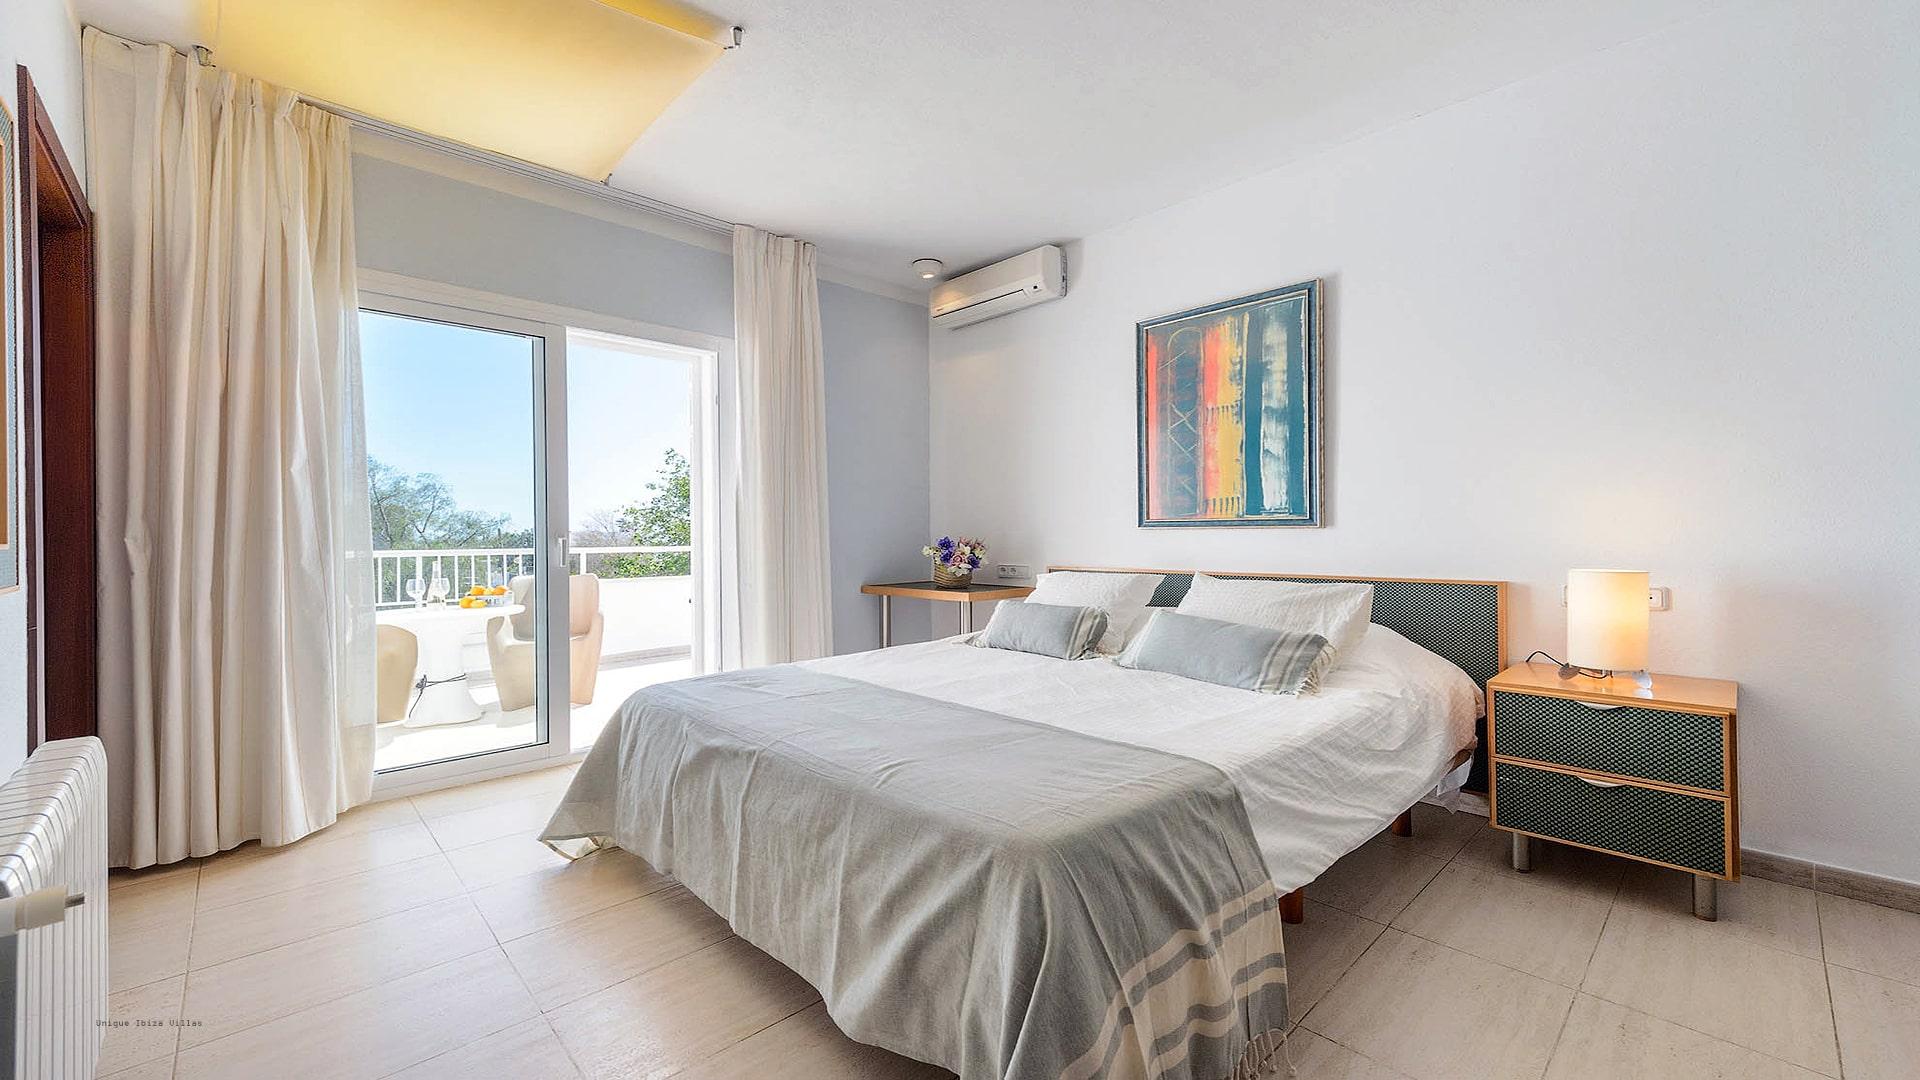 Villa Can Fluxa Ibiza 39 Bedroom 2